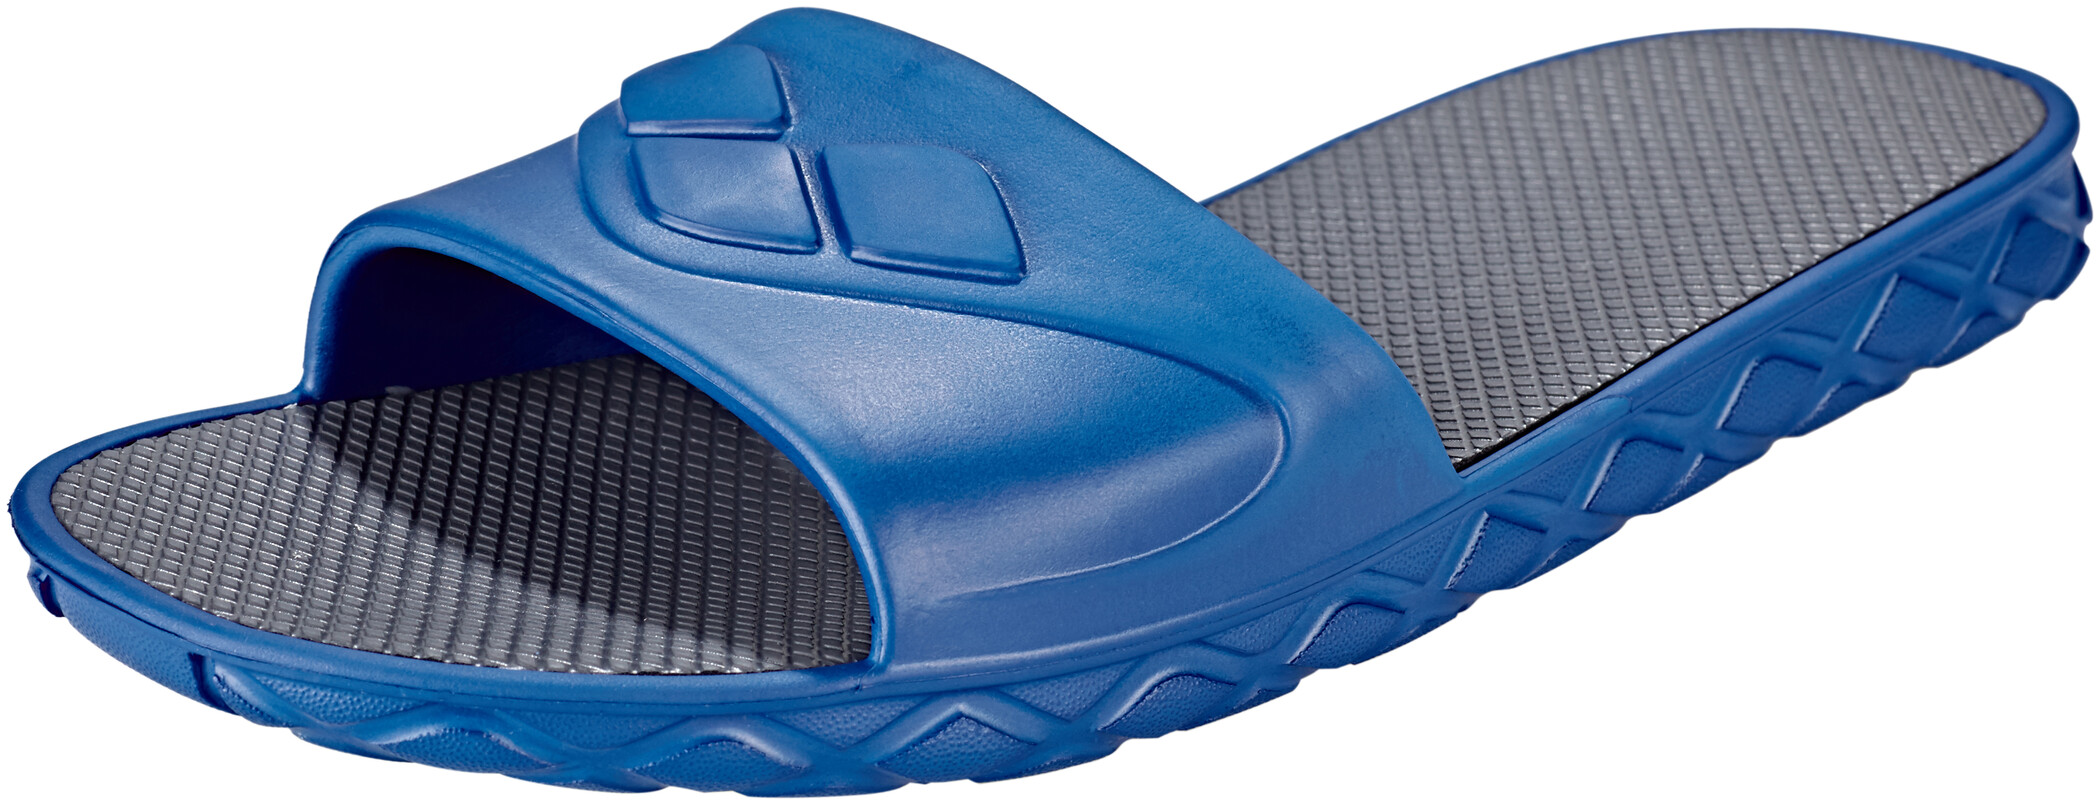 arena Watergrip Sandaler Herrer, blue-dark grey (2019) | item_misc